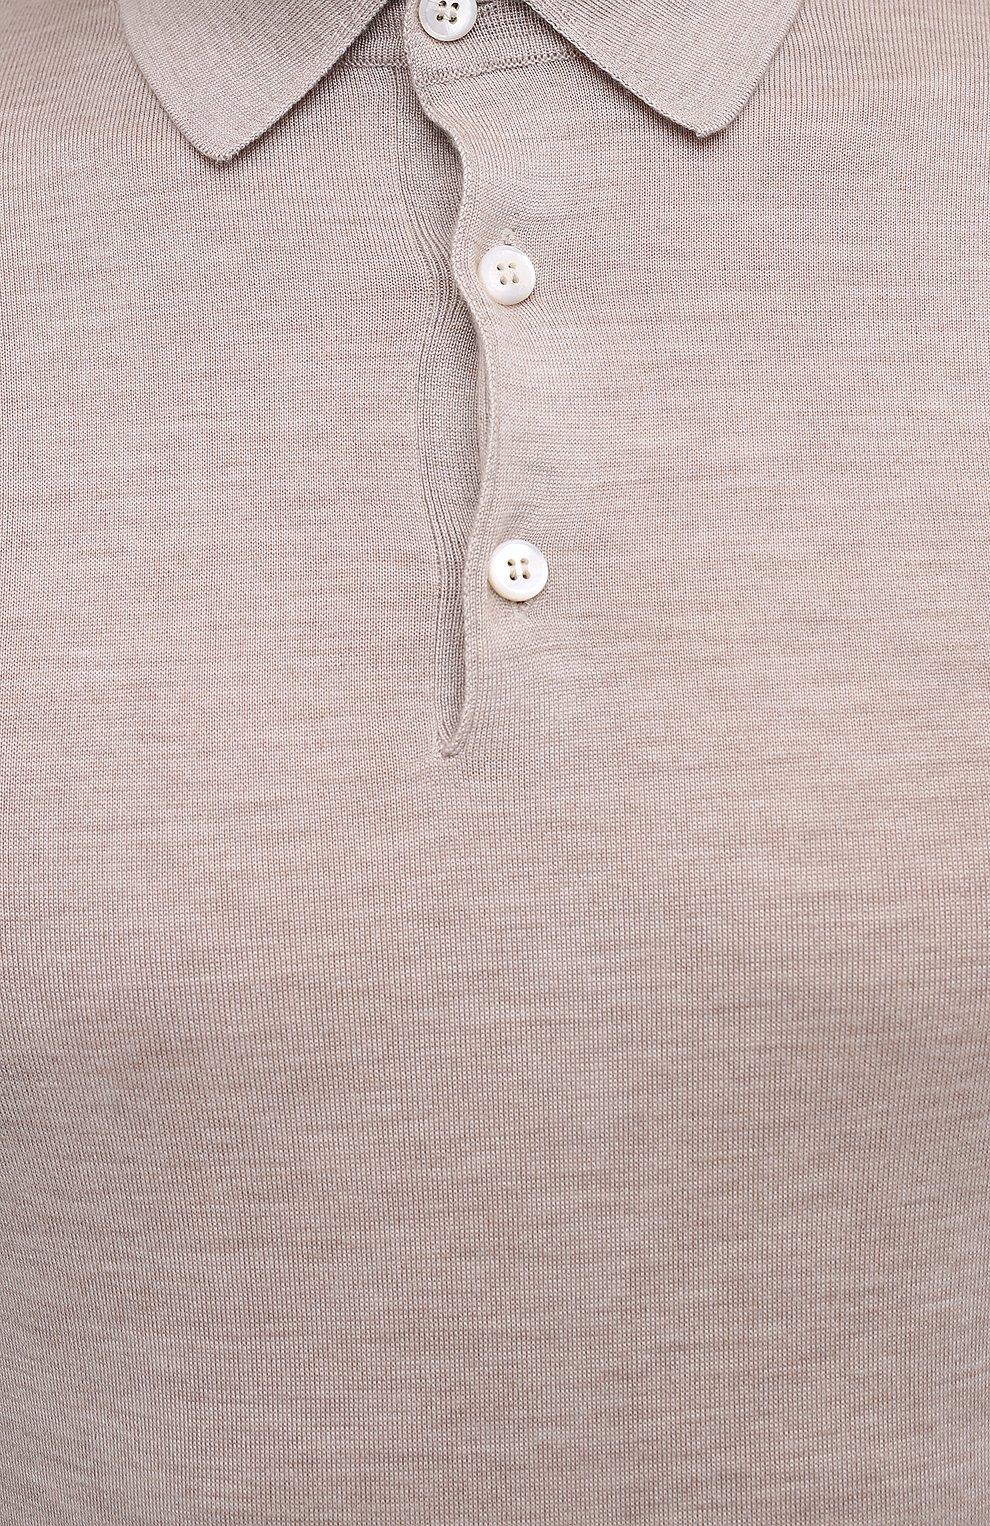 Мужское поло из кашемира и шелка BRIONI светло-бежевого цвета, арт. UMR30L/P9K28 | Фото 6